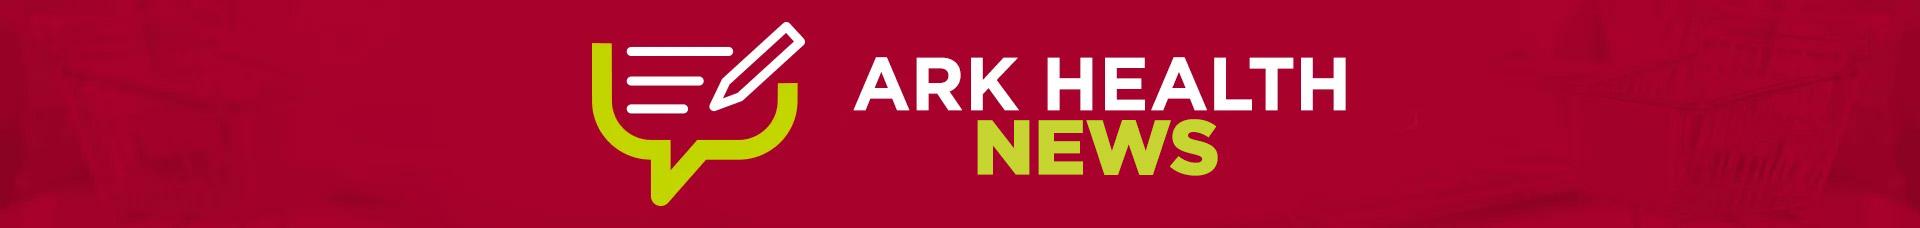 blog_header_arkhealth